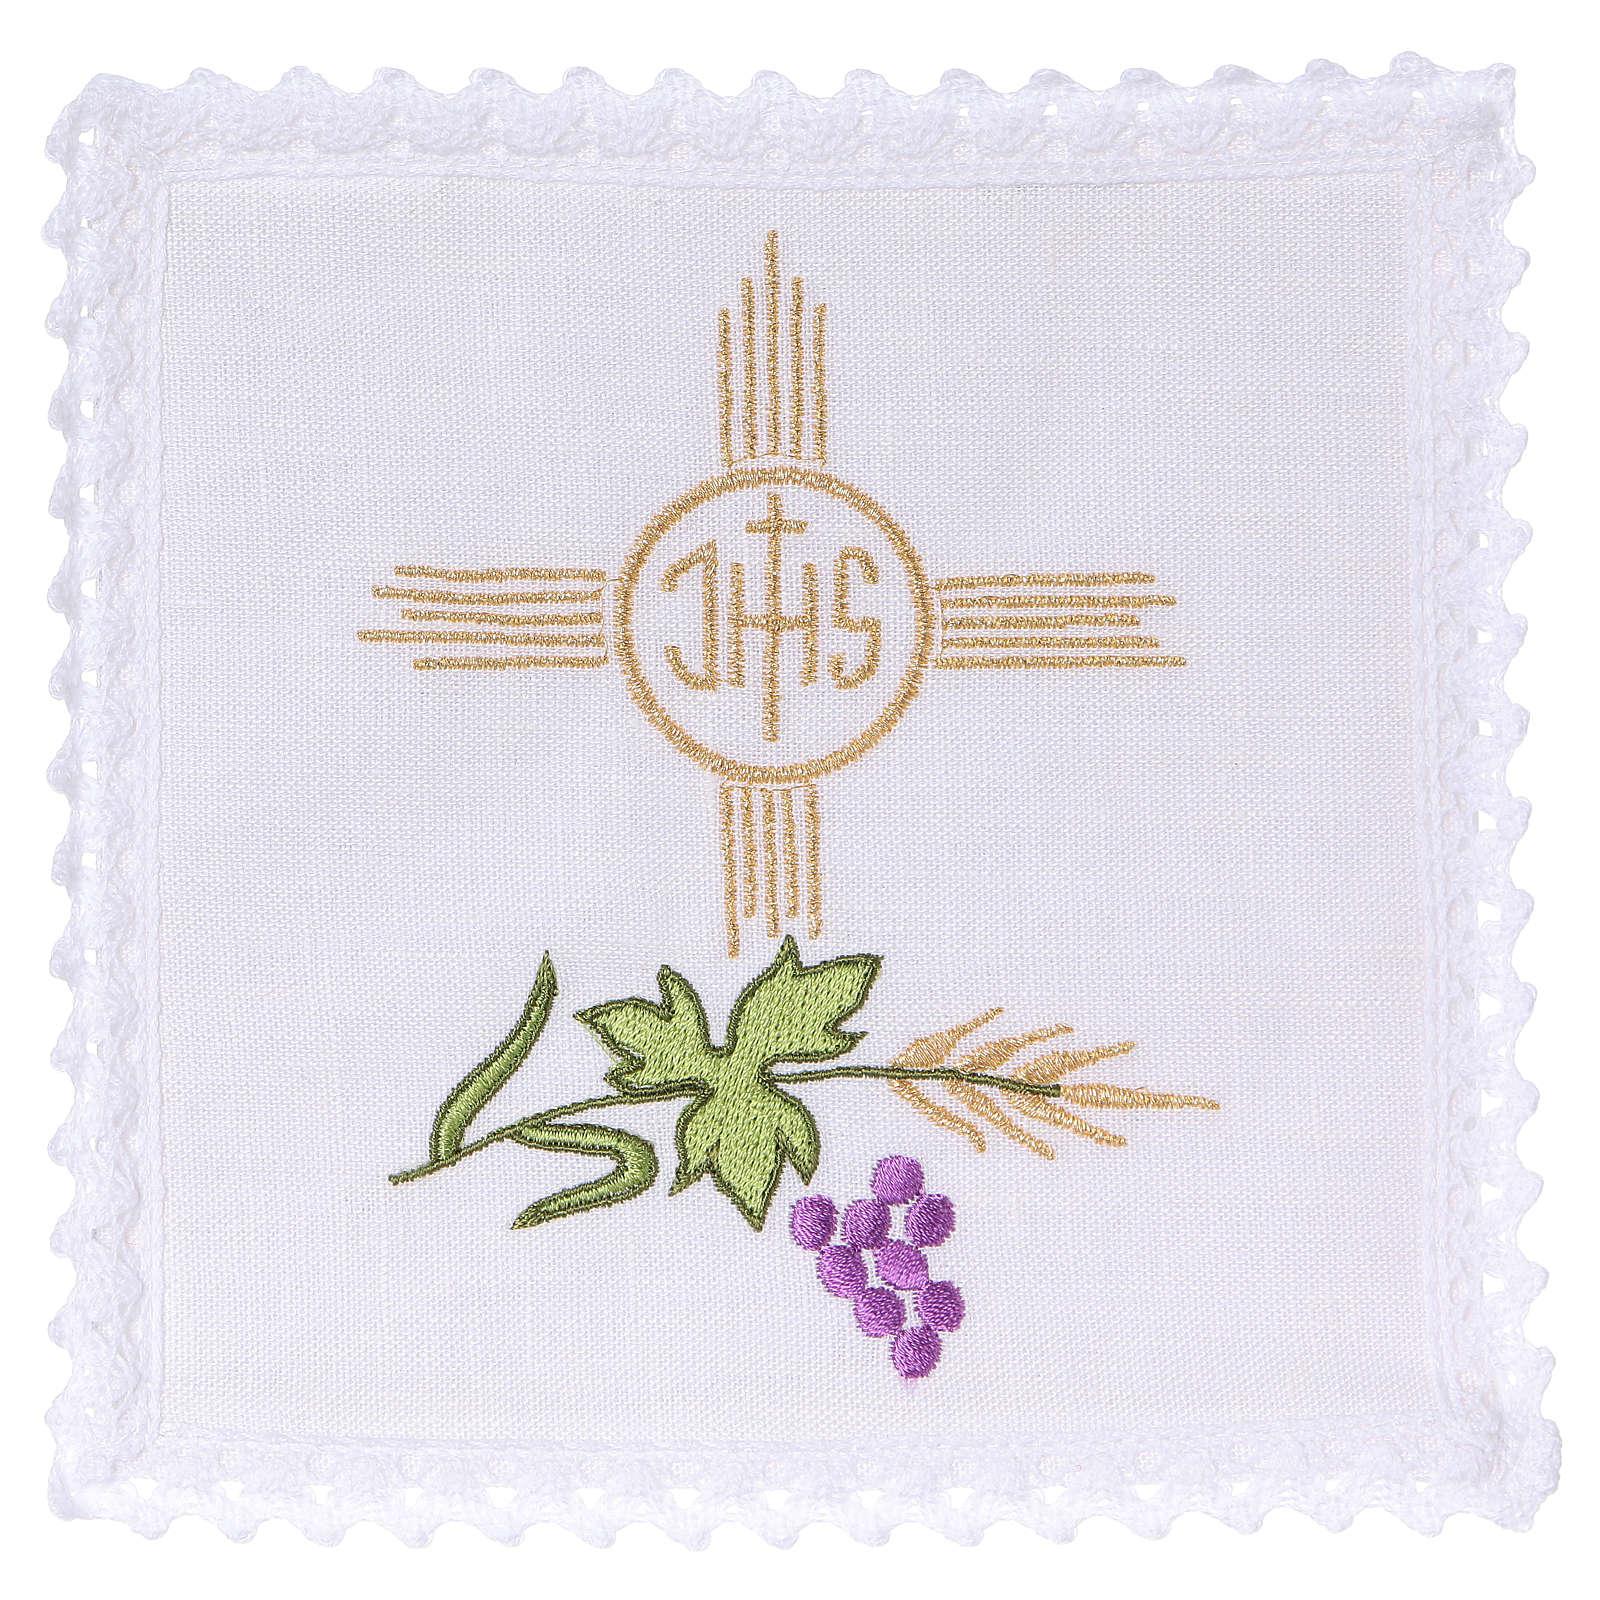 Servicio de altar hilo espiga uva hoja símbolo JHS 4